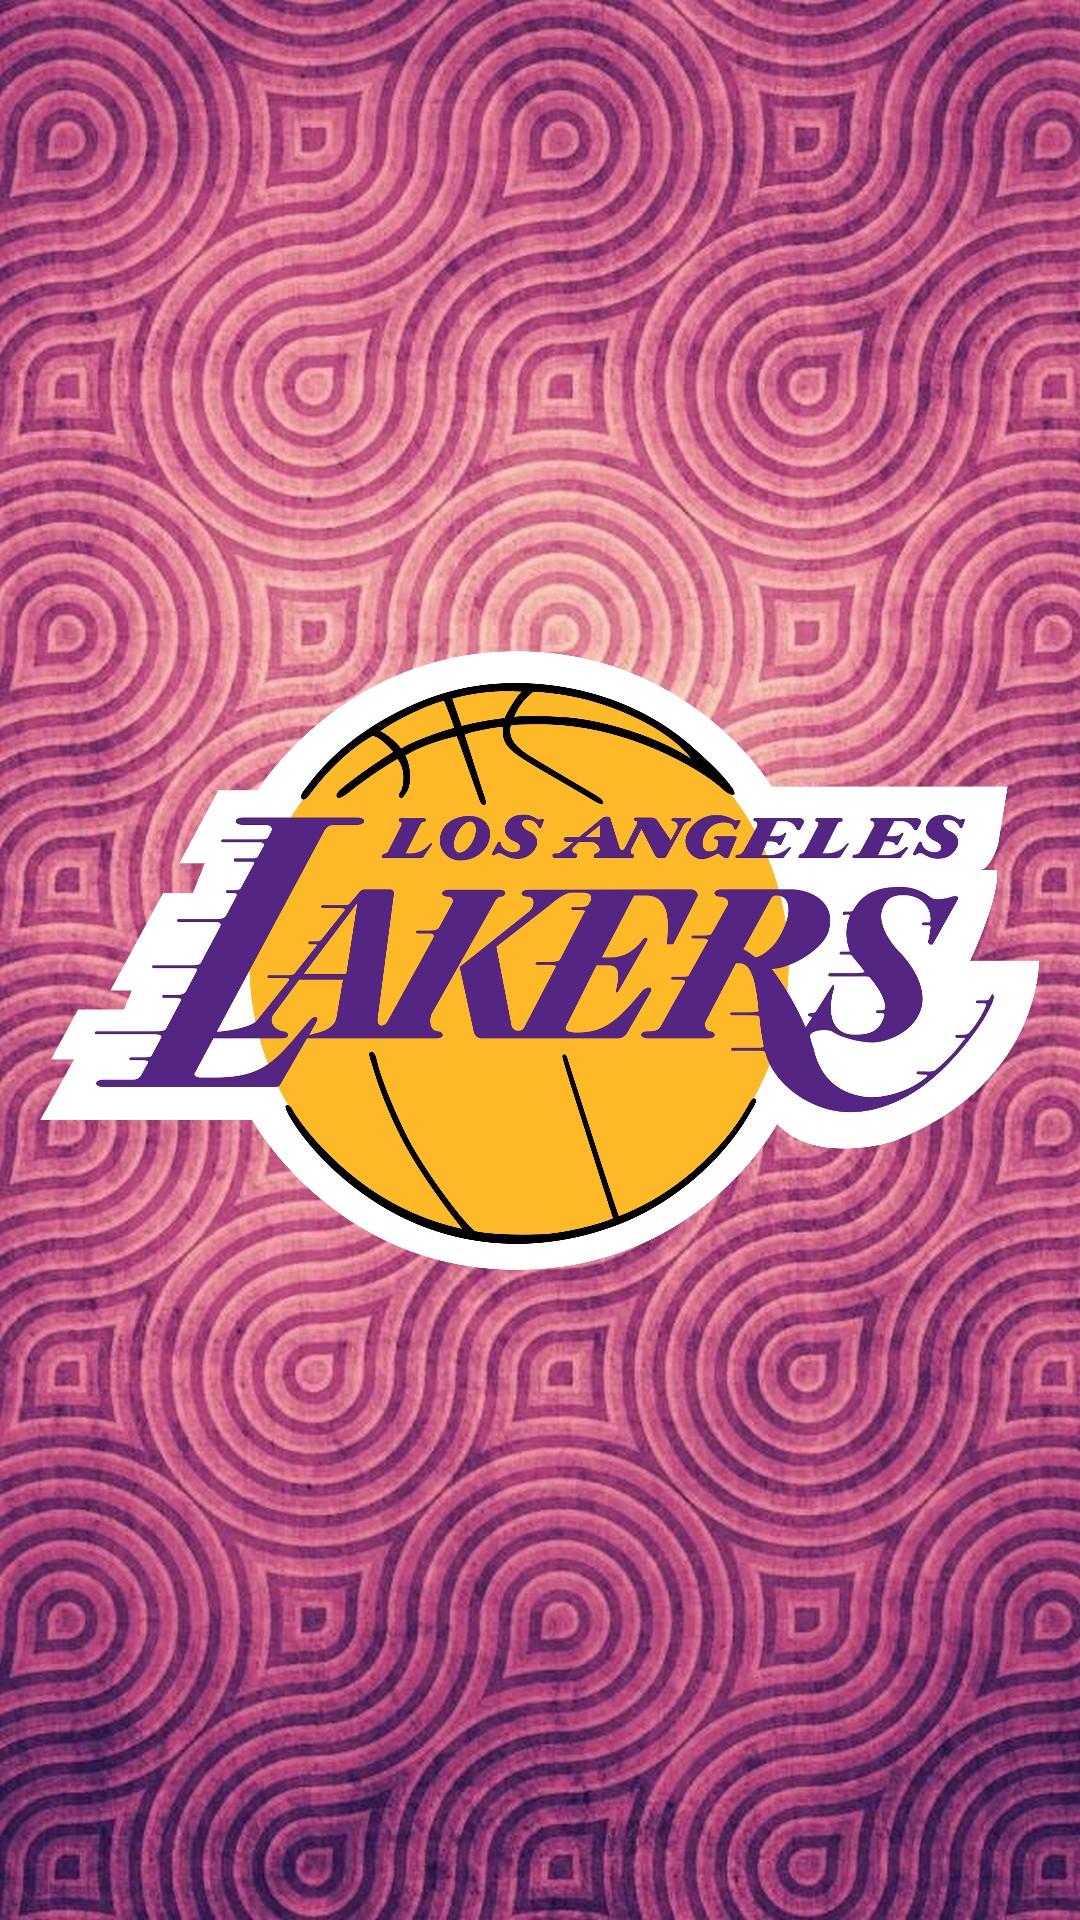 LA Lakers iPhone XS Wallpaper   2020 NBA iPhone Wallpaper 1080x1920